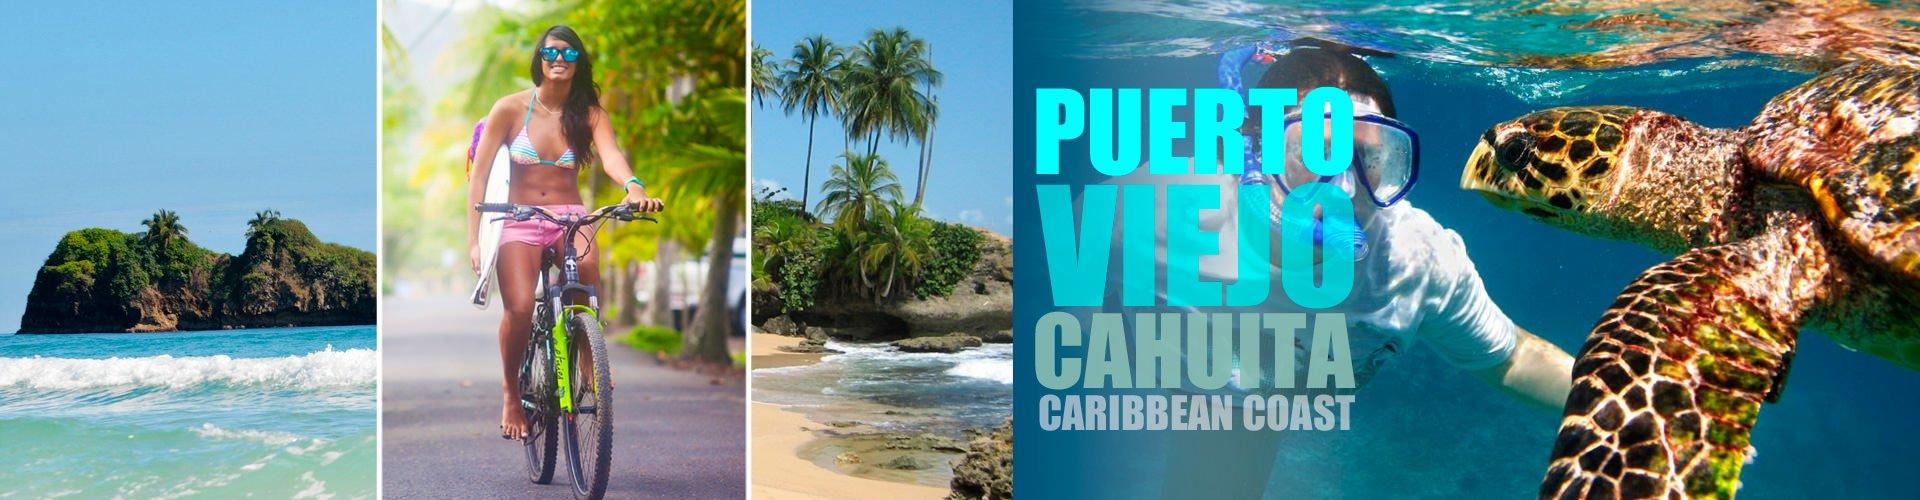 Puerto Viejo – Cahuita